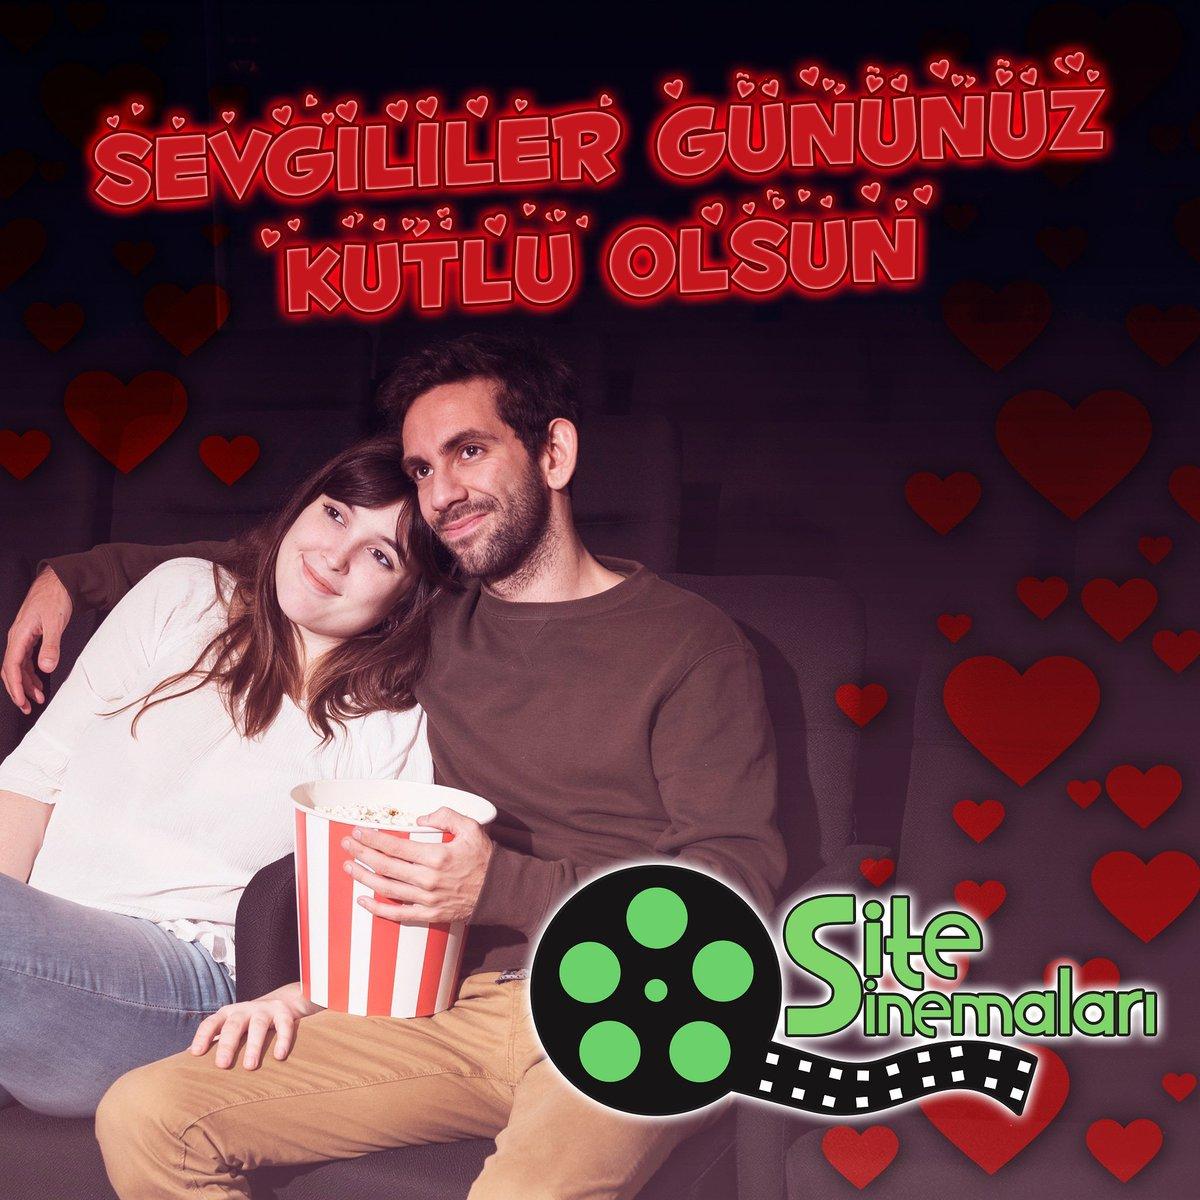 Sevgililer Gününüz Kutlu Olsun #14şubatsevgililergünü #happyvalentinesday #love #romanticmovie #aşk #sevgi #sitesinemaları #movie #movies #sinema #film #sinemakeyfi #sinemafilmi #movienight #movietimepic.twitter.com/w9onkUFAn7